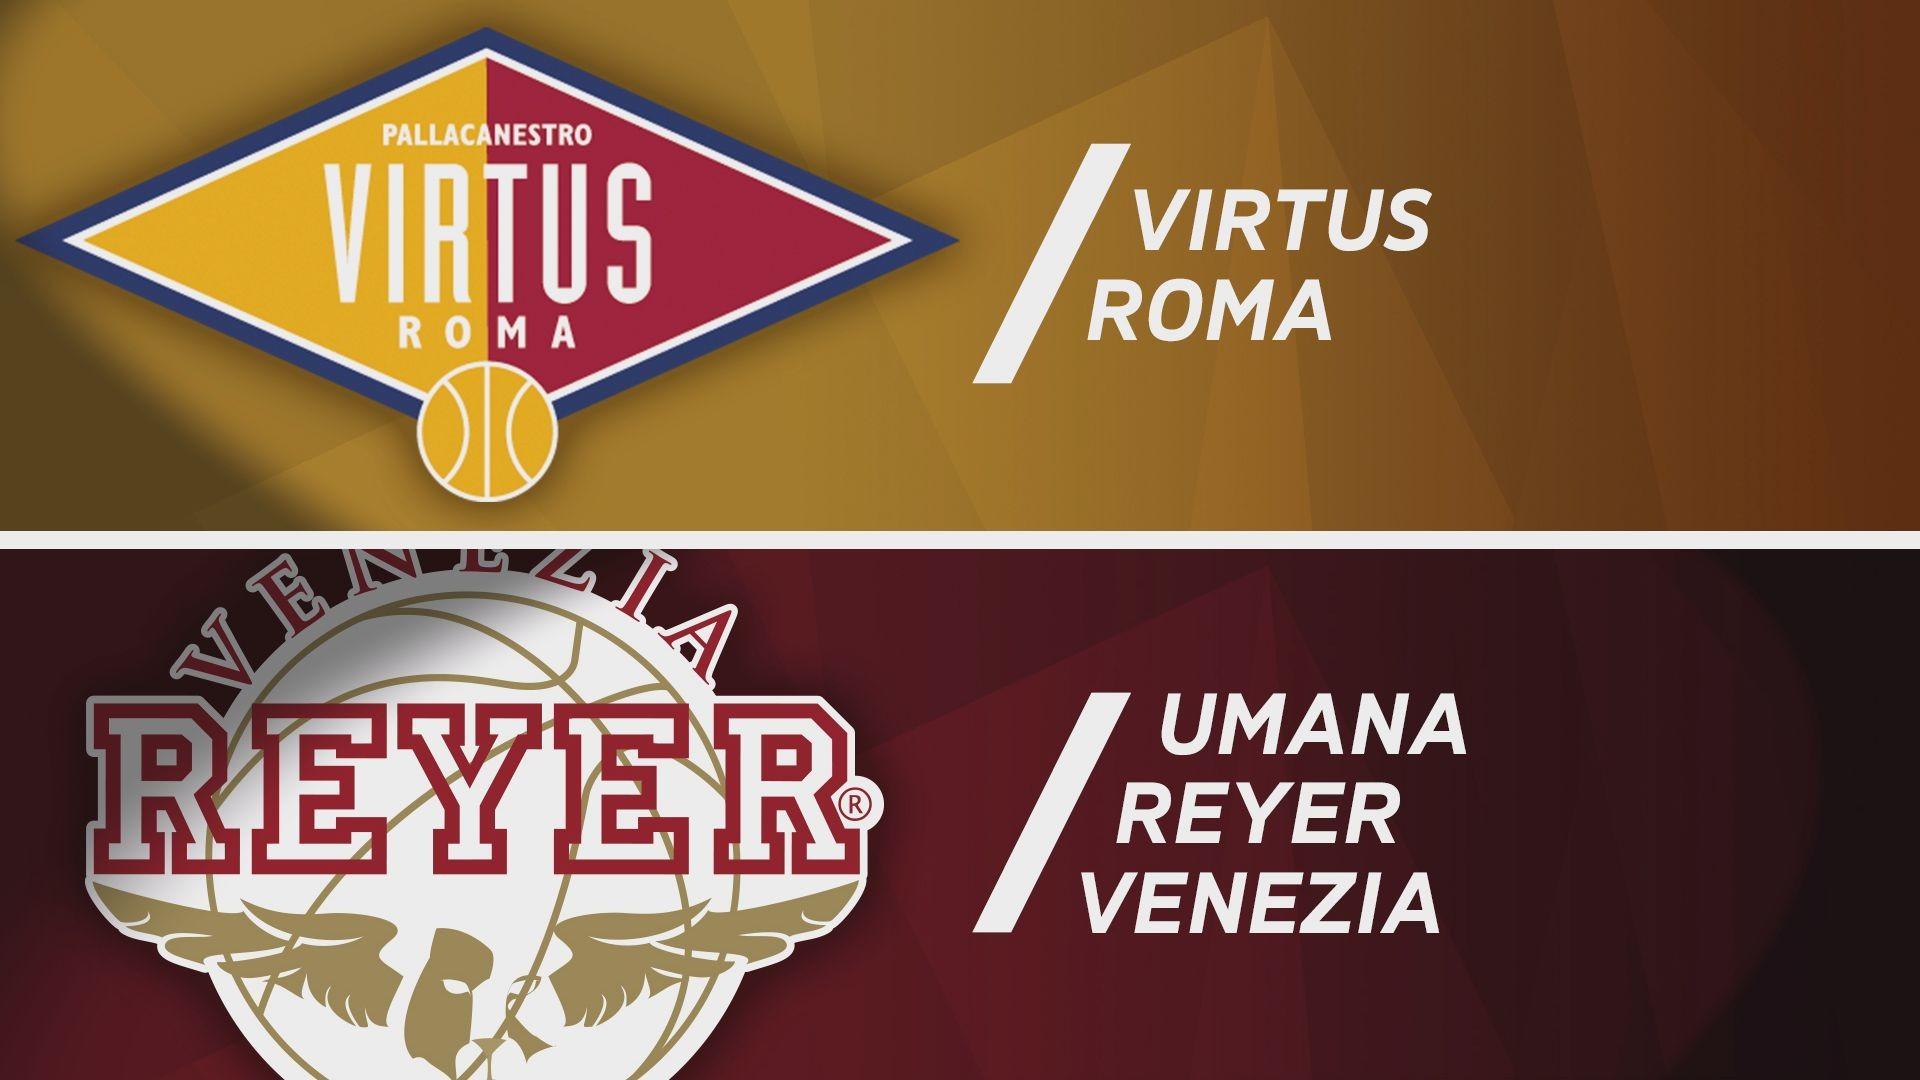 Virtus Roma - Umana Reyer Venezia 71-89